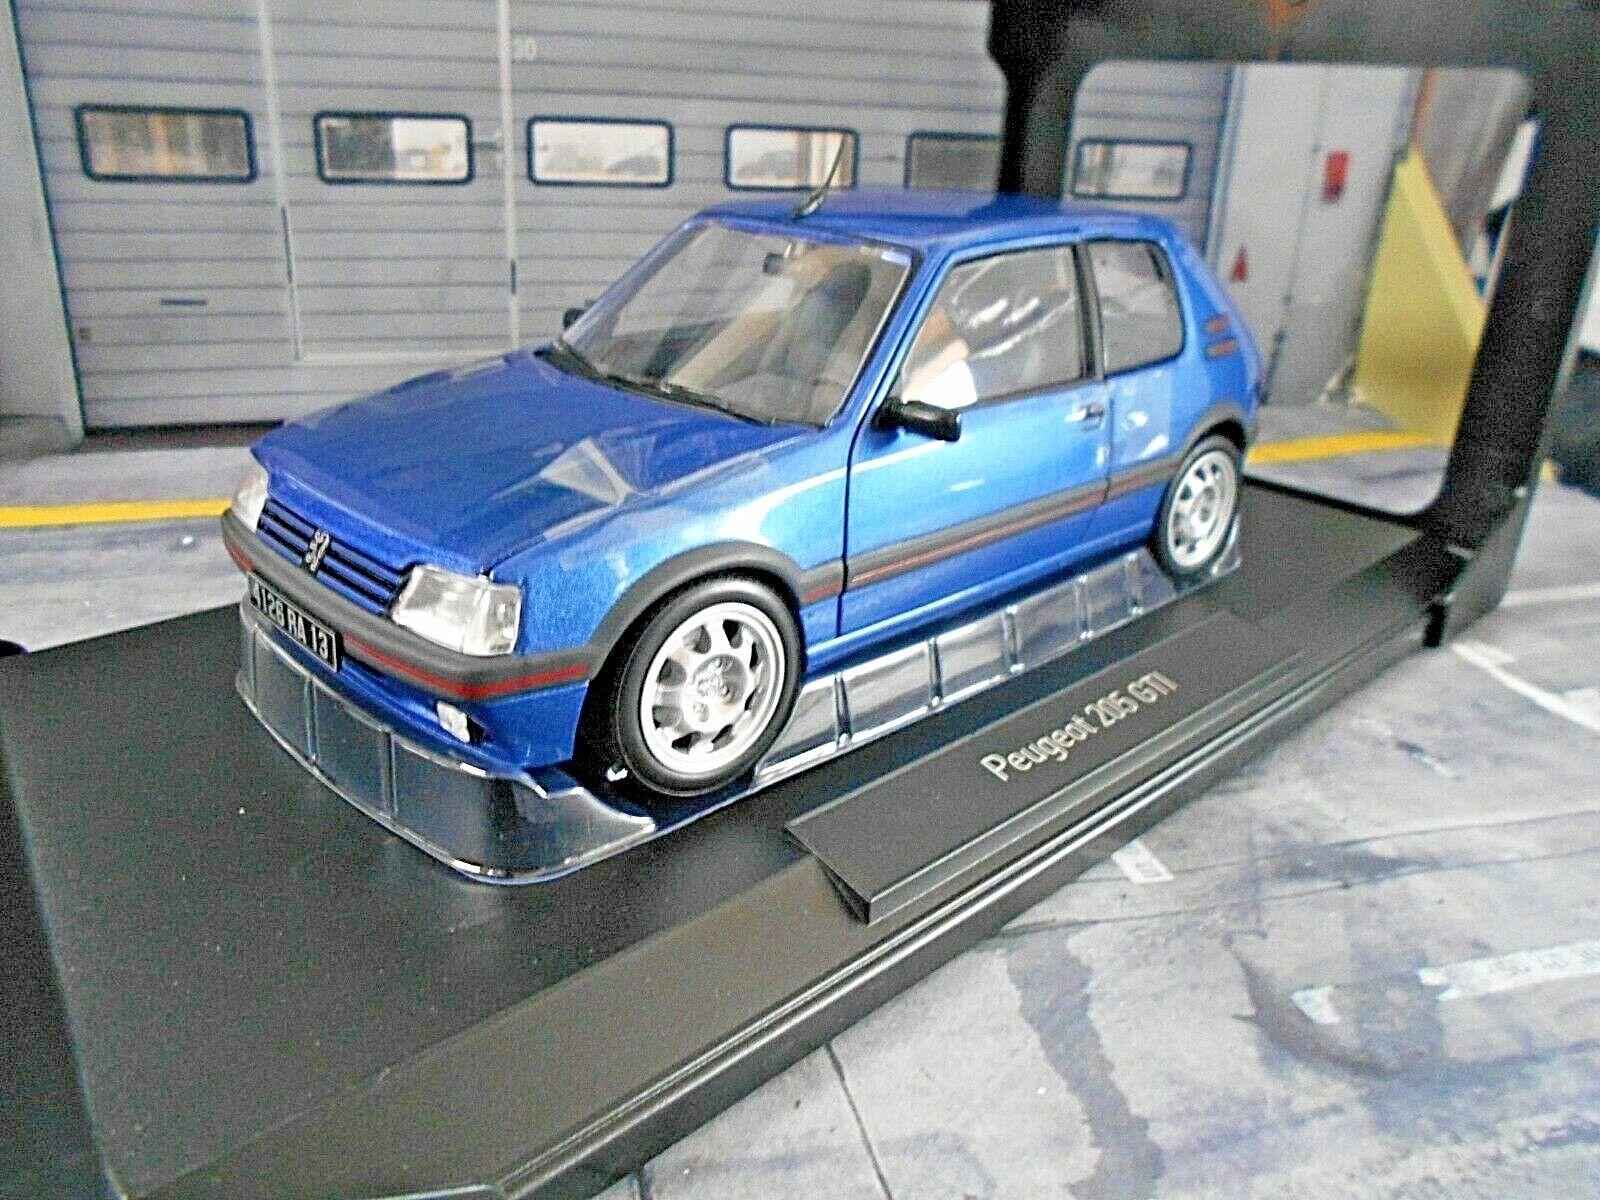 PEUGEOT 205 GTI 1.9 1992 miami bluee blue met. 184856 184856 184856 NEU Norev 1 18 af492a